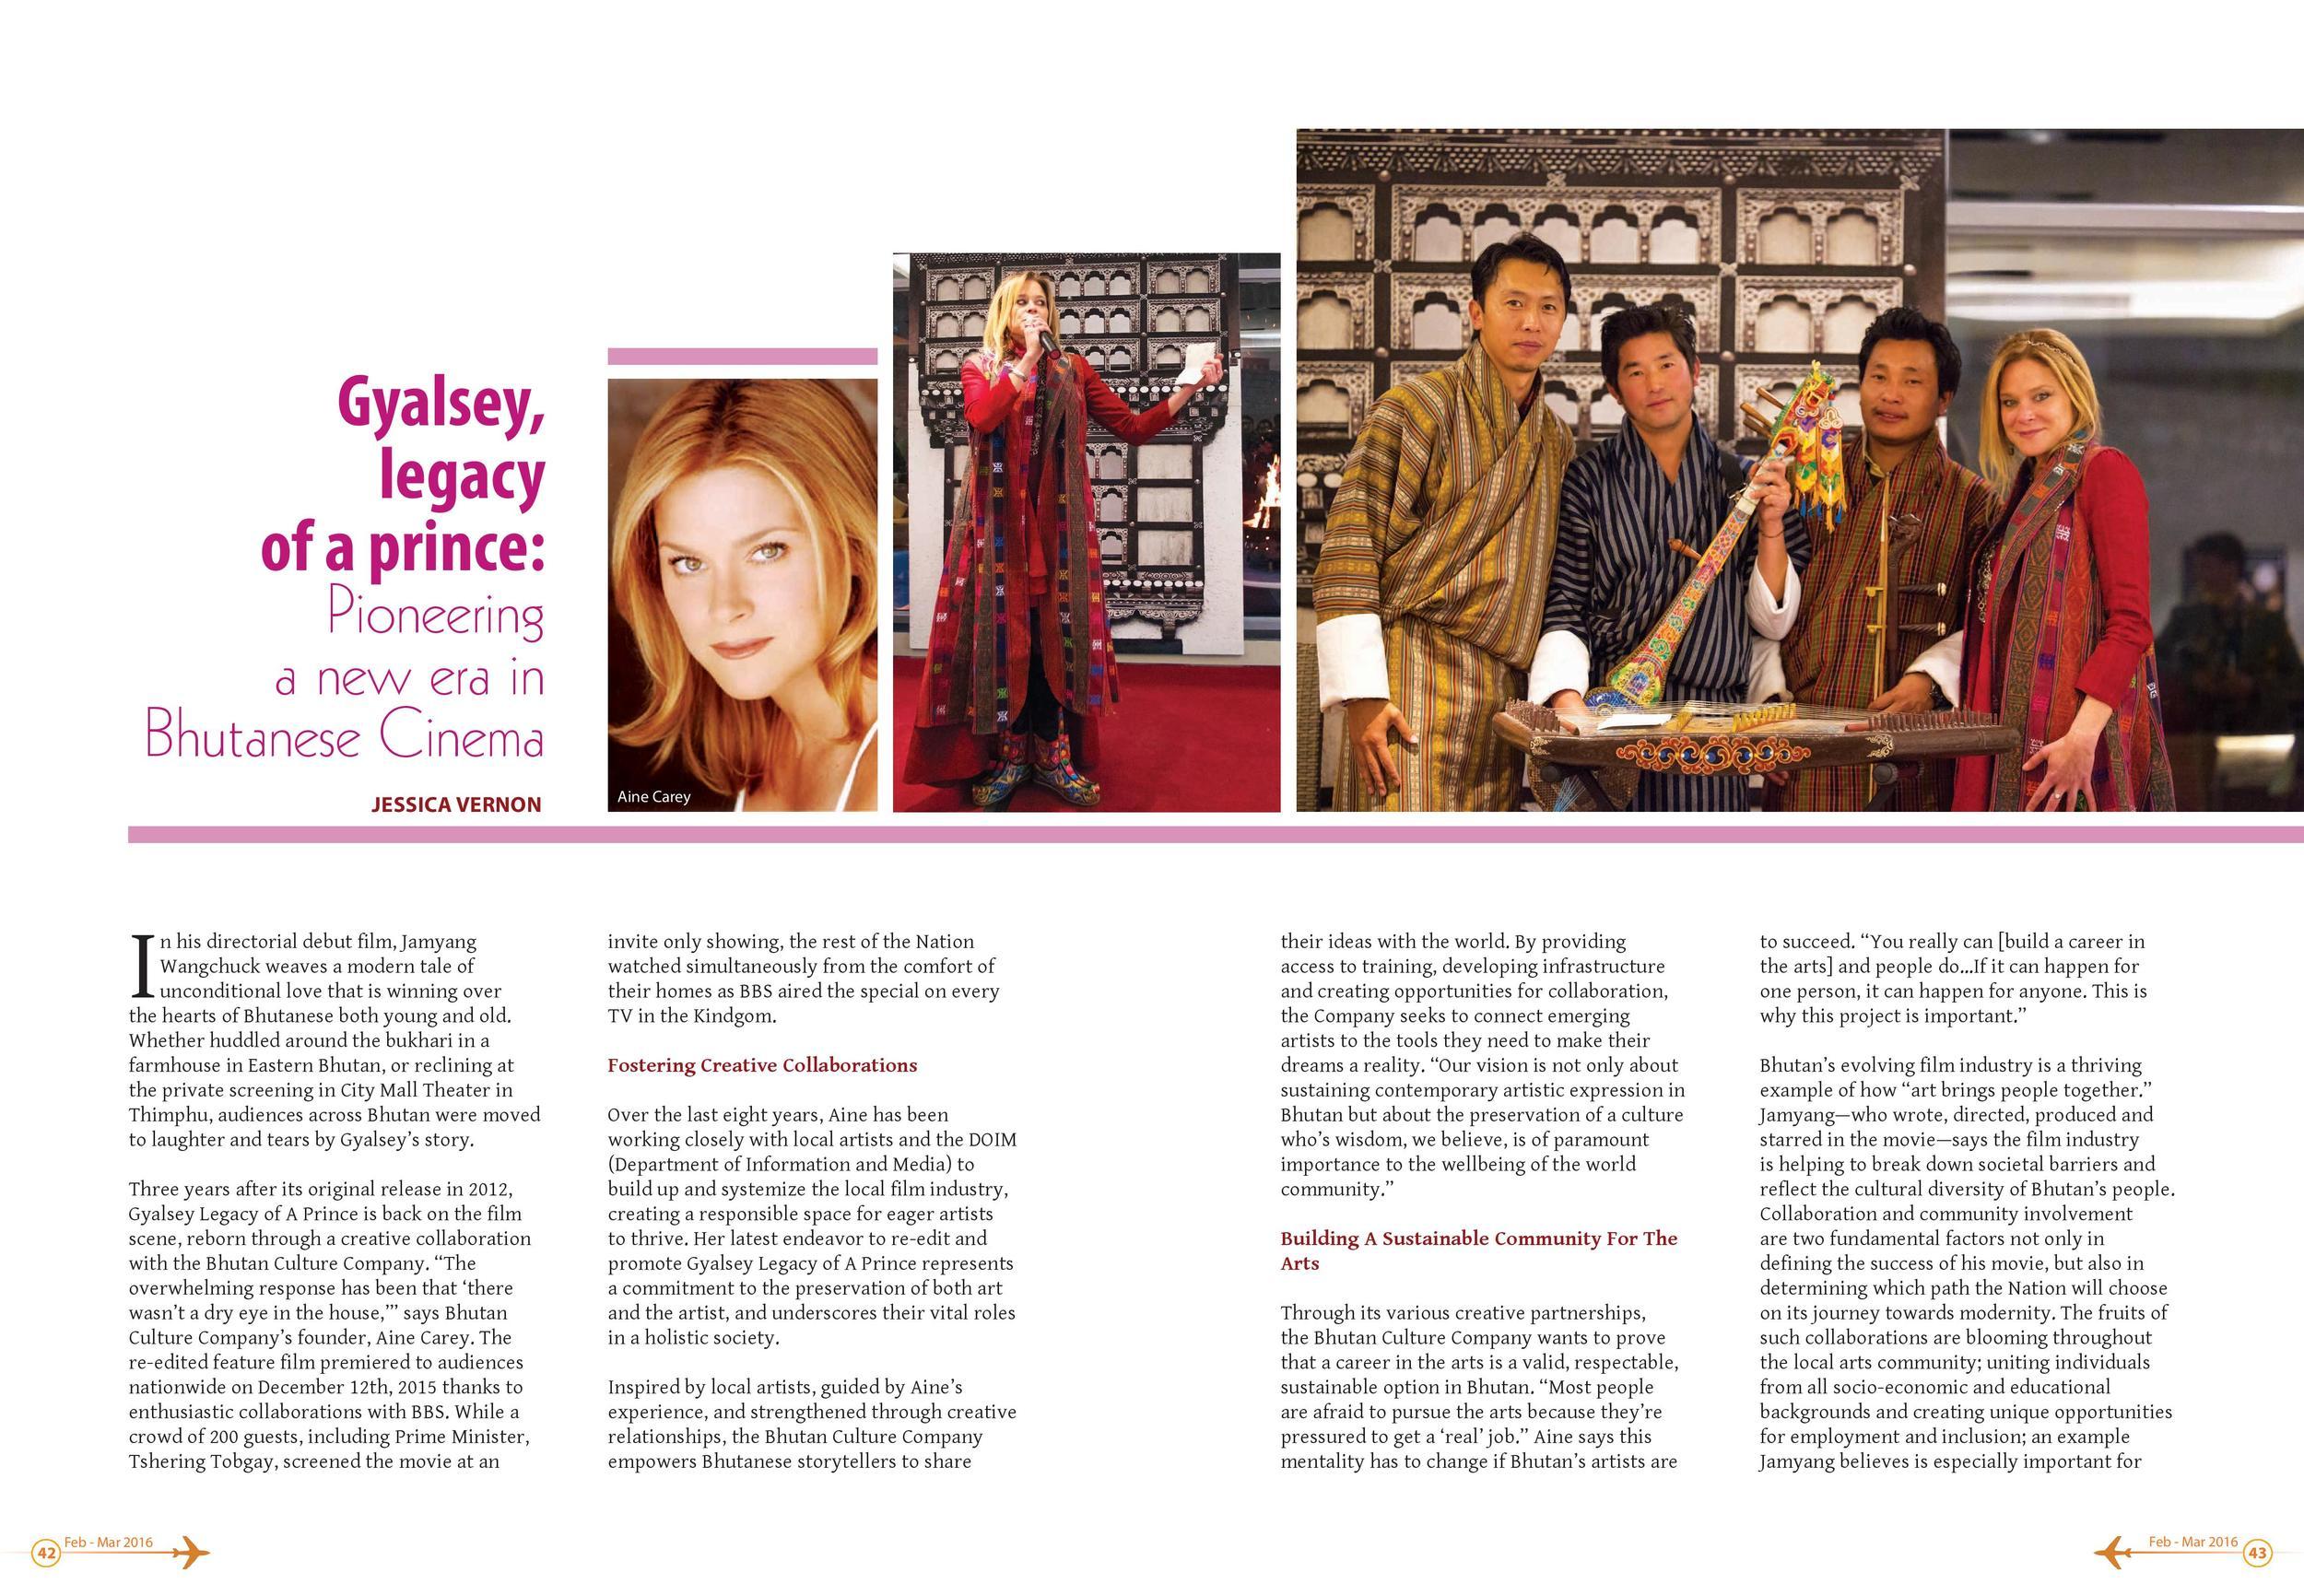 Feb./March 2016: Pioneering a New Era in Bhutanese Cinema